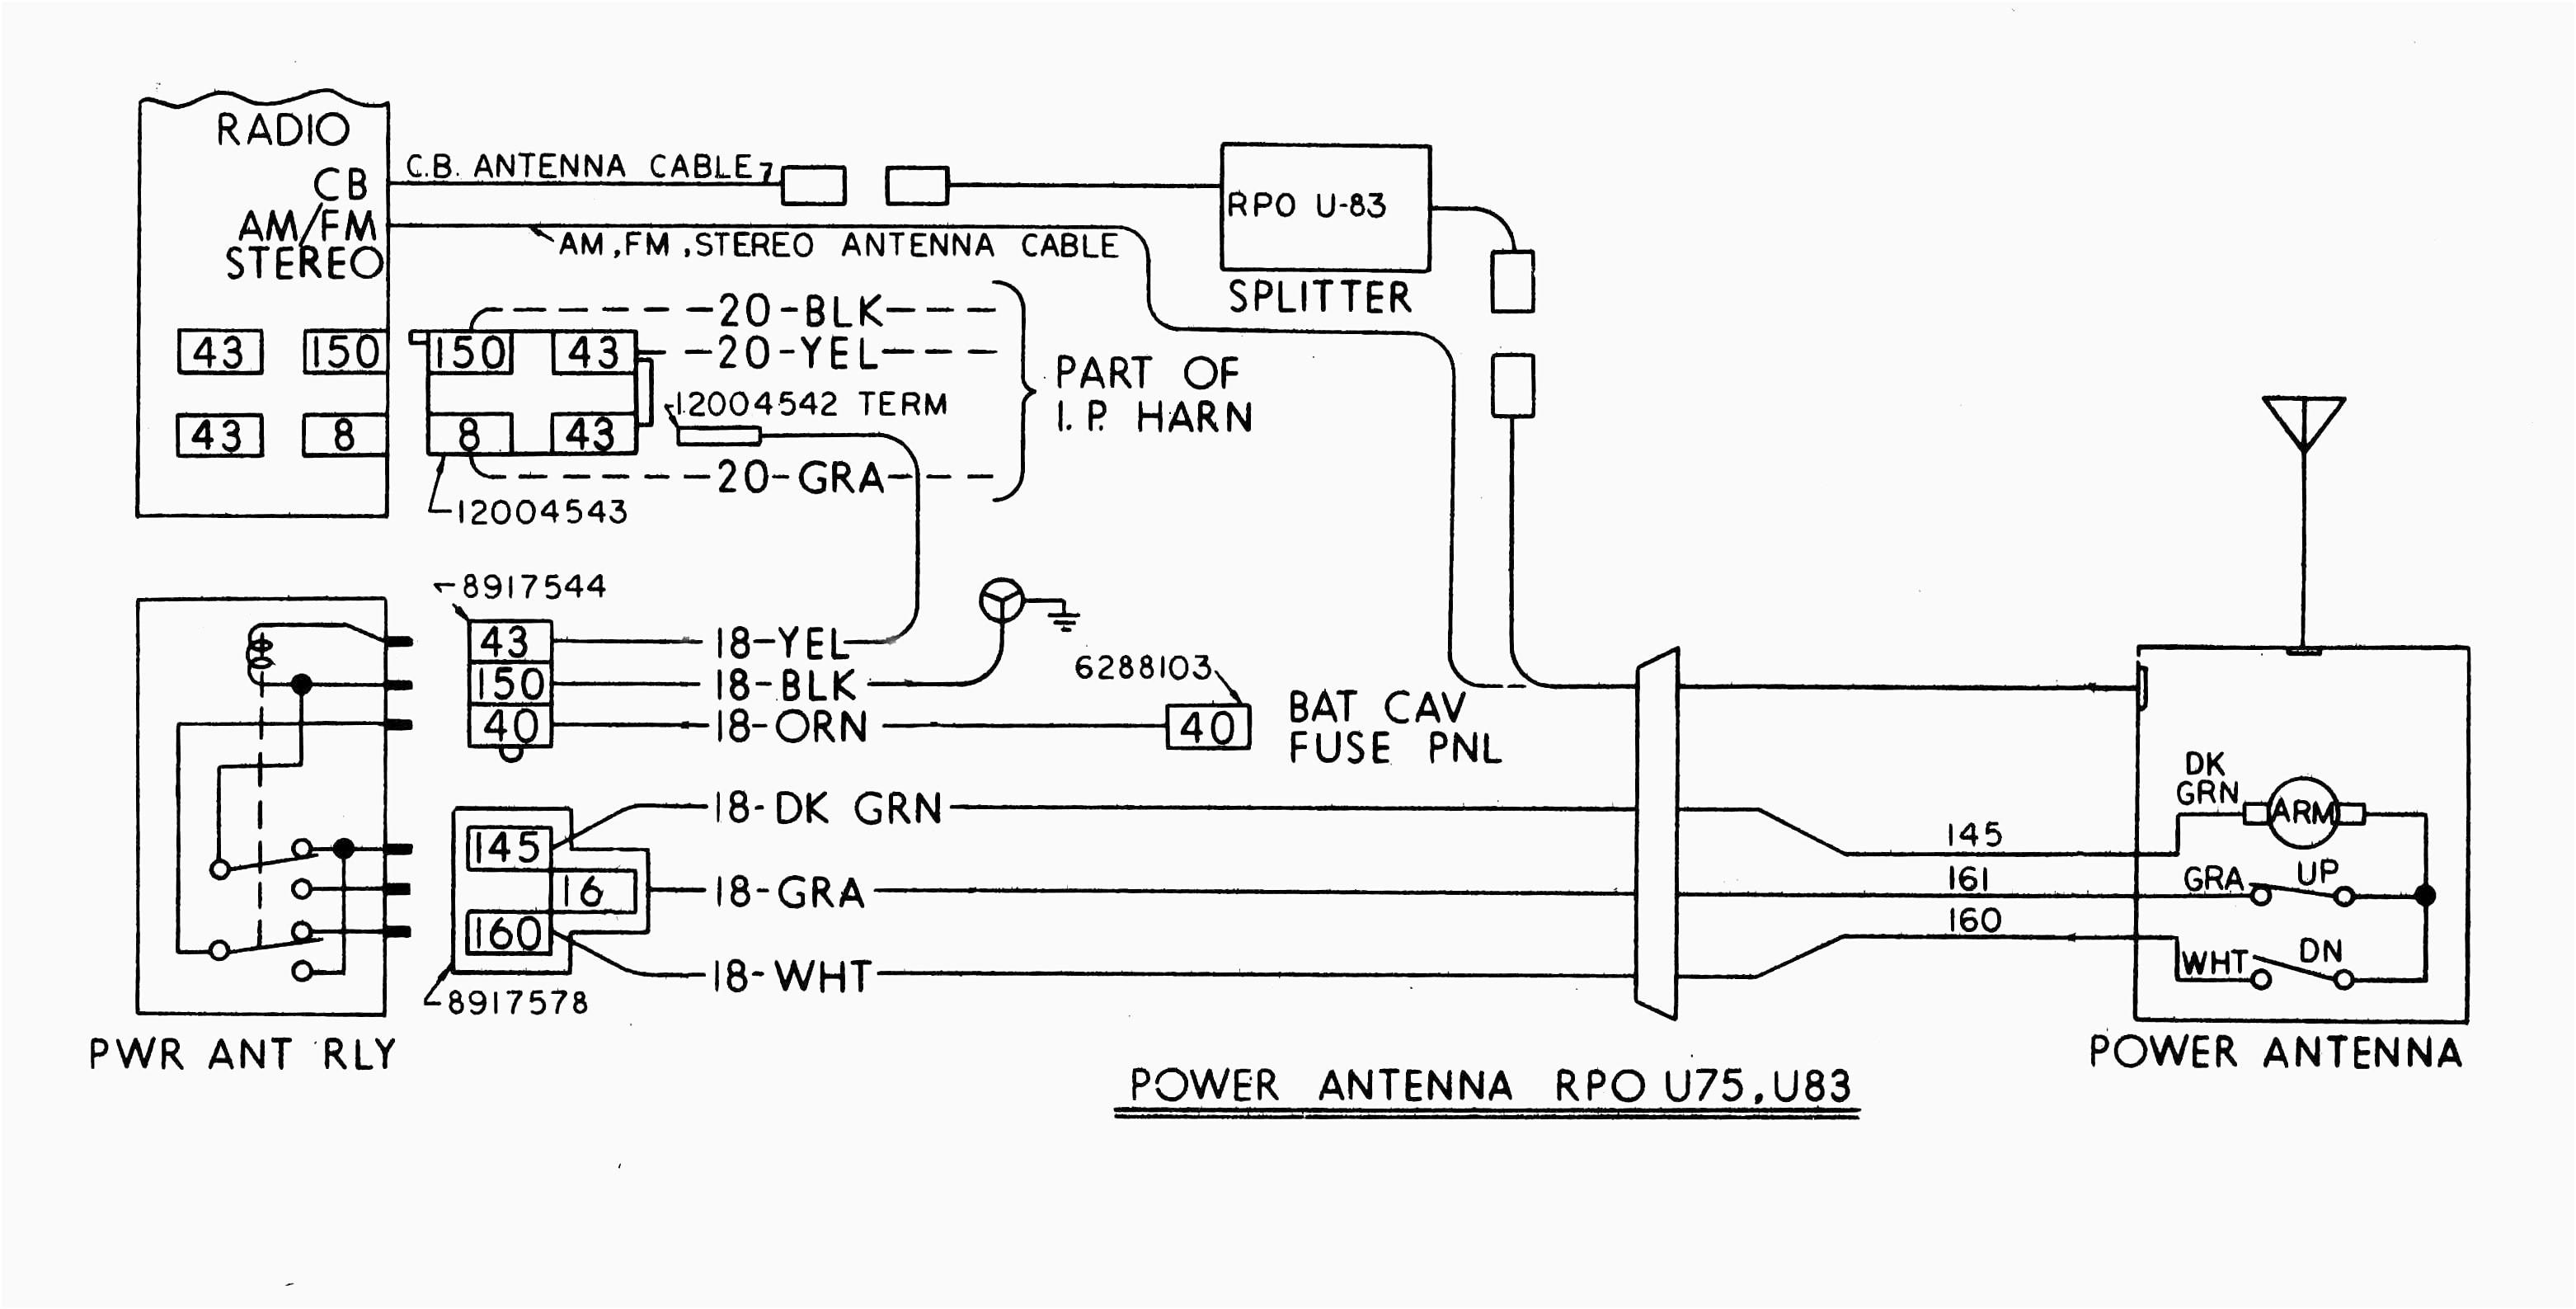 Car Power Antenna Wiring Diagram Dodge Caliber Fuse Unusual